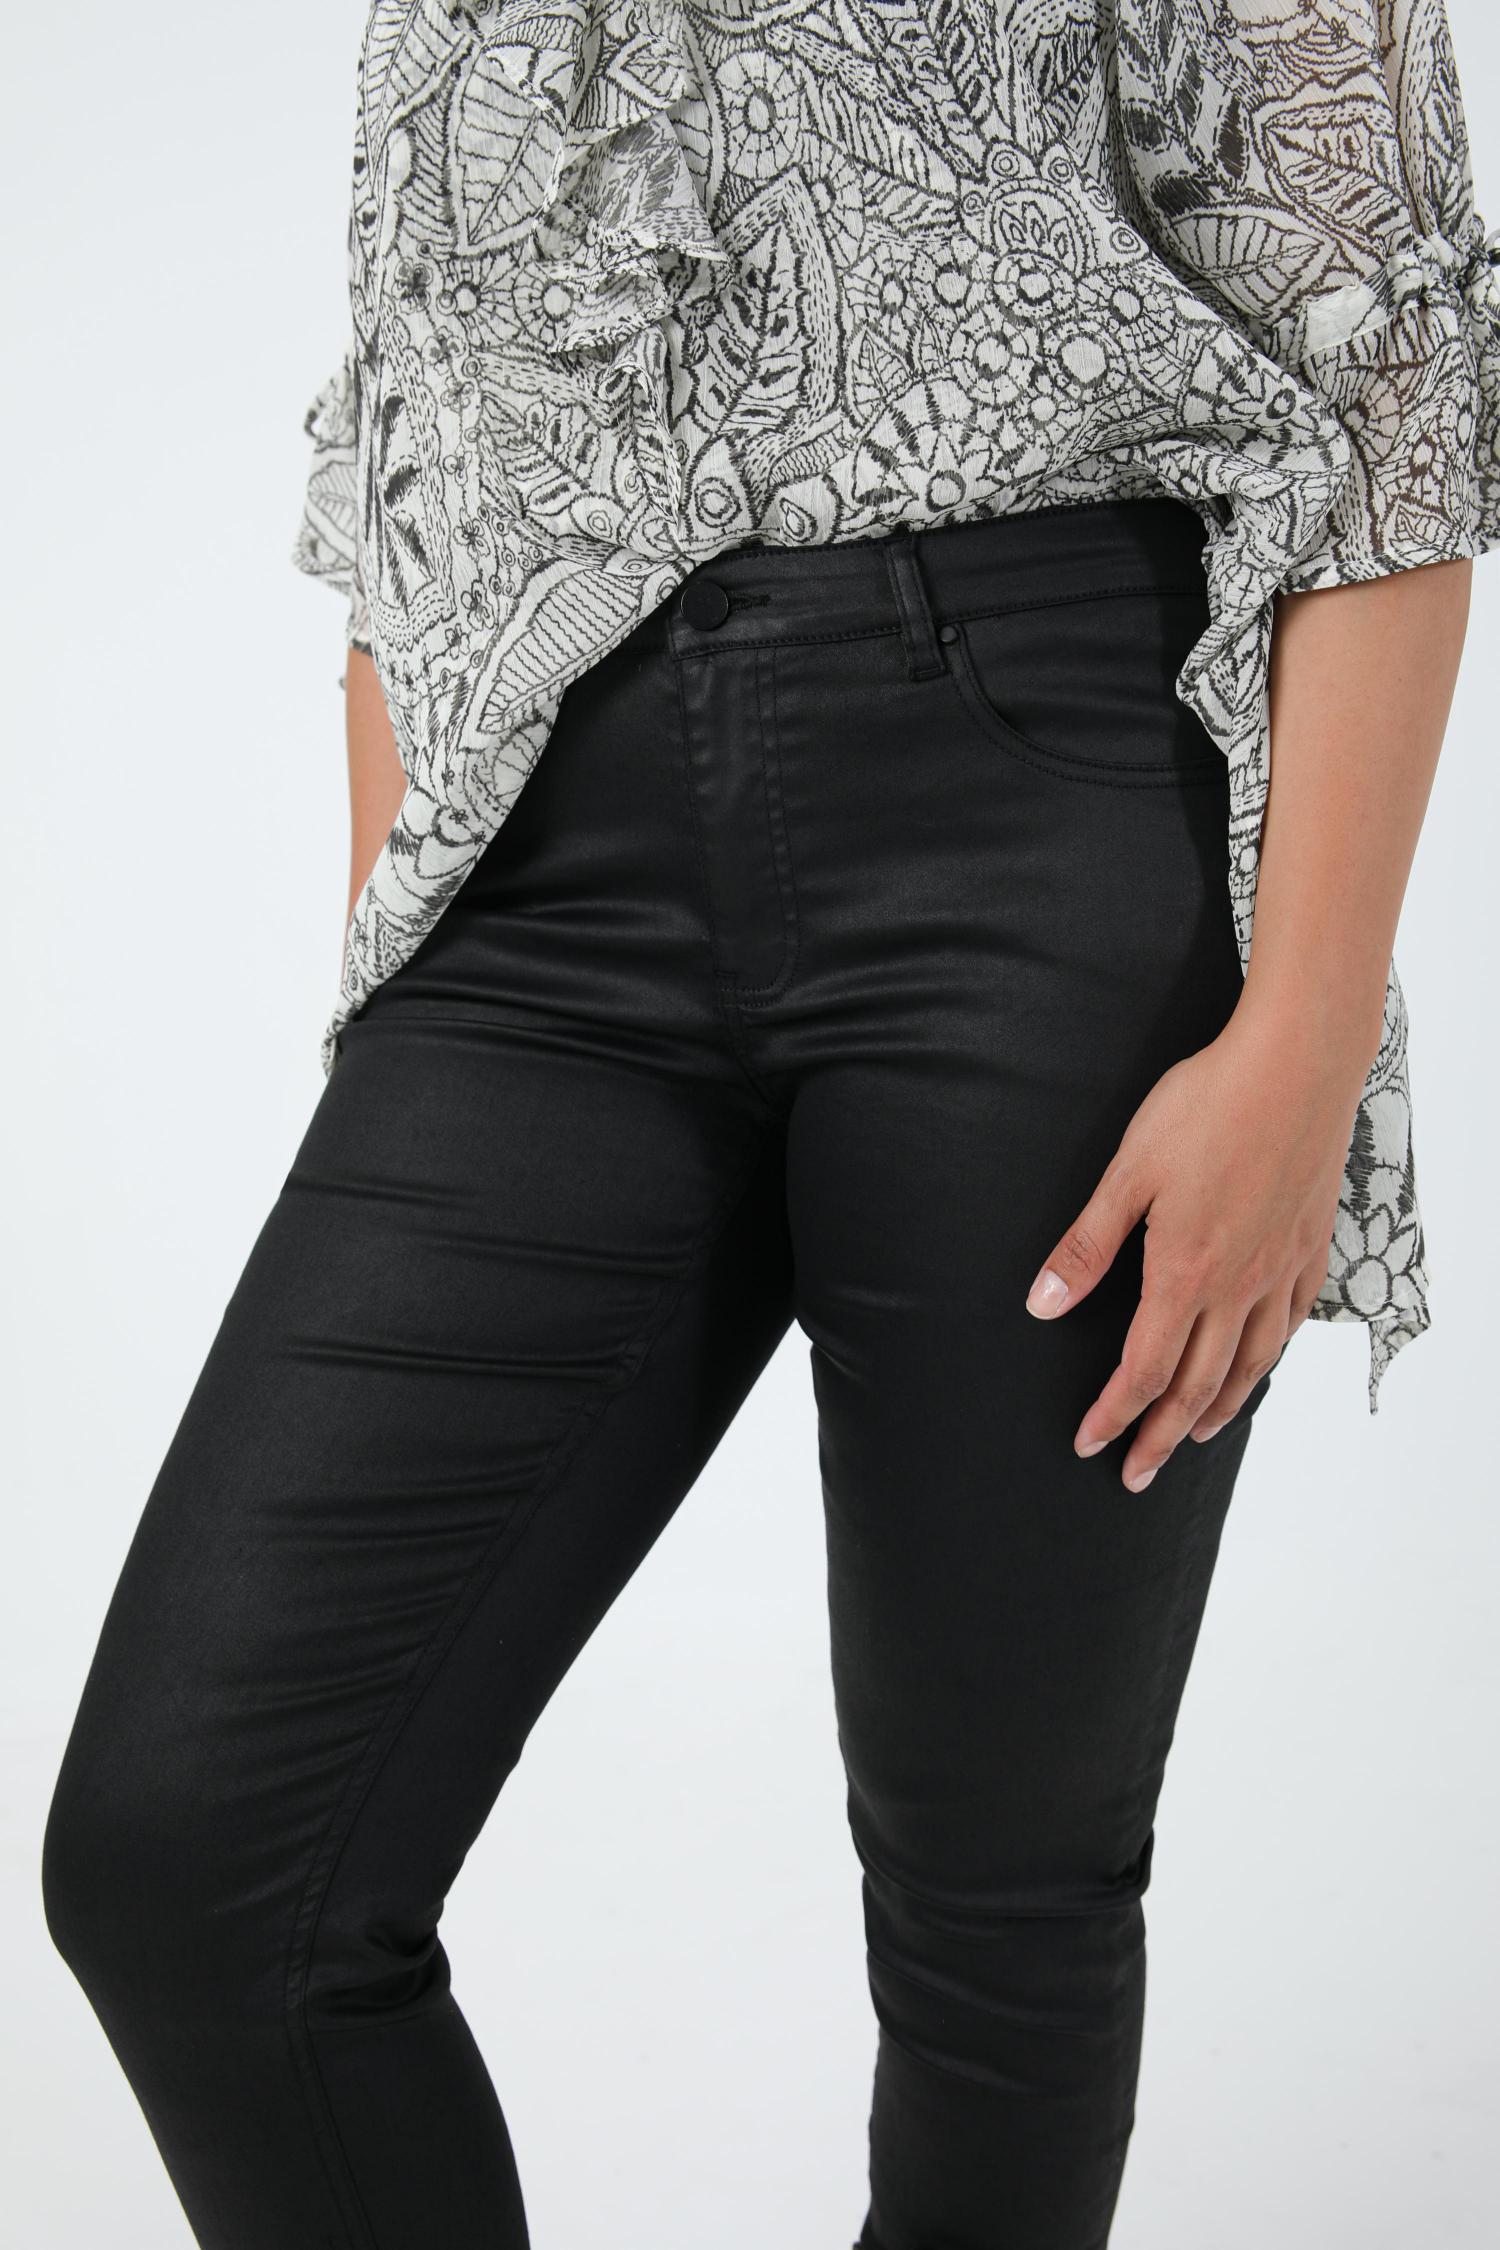 5-pocket oiled pants (Shipping September 25/30)